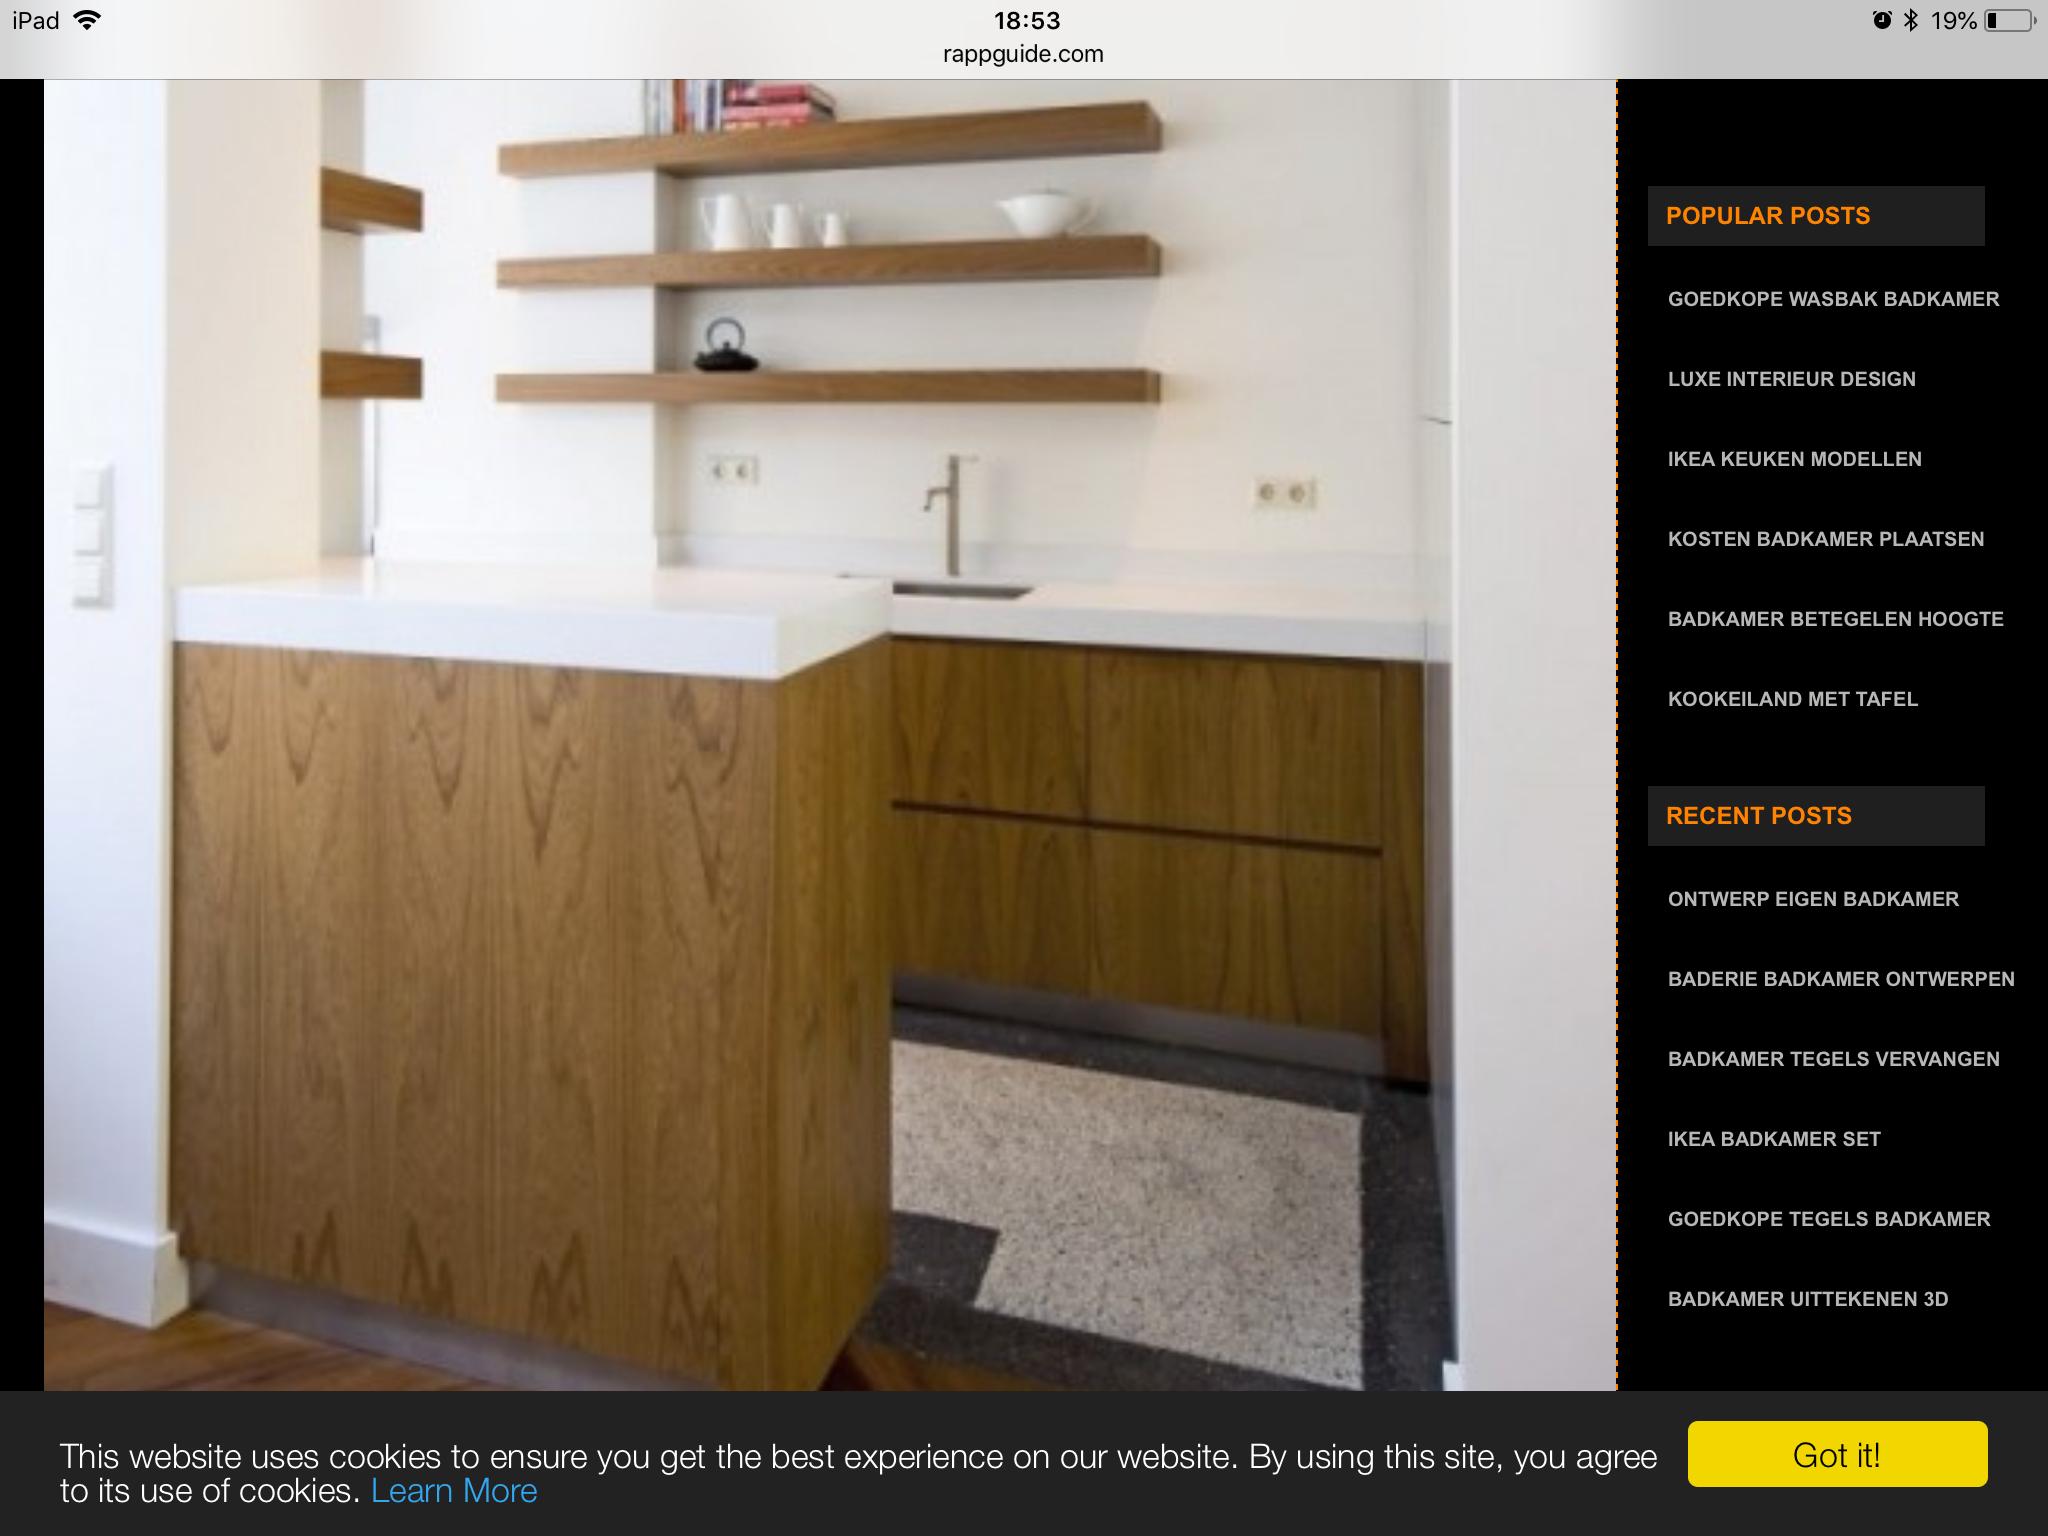 Baderie Badkamer Ontwerpen : Pin by janet on jaren dertig huis pinterest